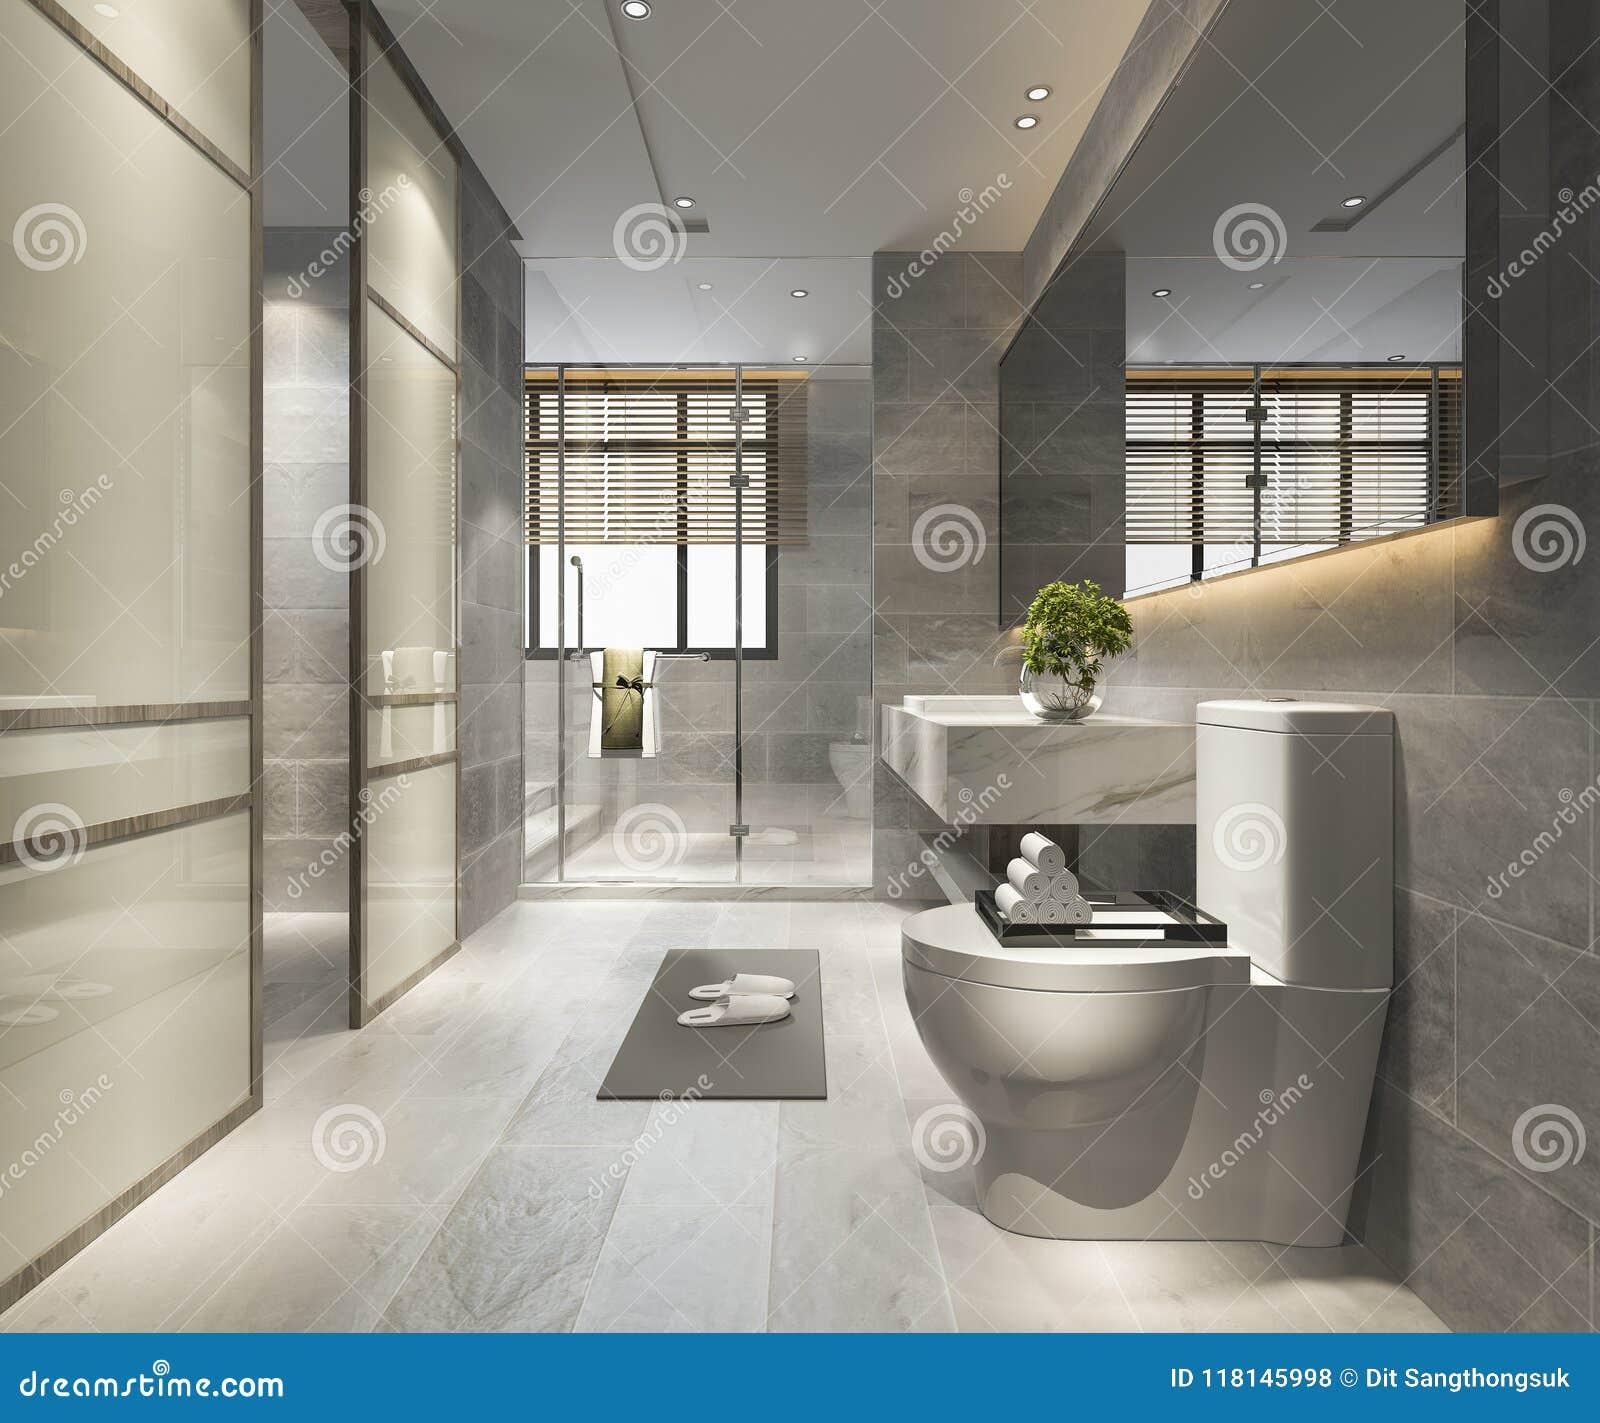 3d Rendering Luxury Modern Design Bathroom And Toilet Stock ... on modern bathroom troughs, modern bathroom tile, modern bathroom ceilings, modern bathroom valves, modern bathroom vanity unit, modern bathroom chairs, toto toilets, jameco toilets, modern bathroom sinks, modern bathtubs, modern bathroom design, modern bathroom stalls, modern showers, modern bathroom plumbing, master bedroom toilets, modern style bathrooms, modern bathroom storage, modern bathroom seating, modern bathroom backsplashes, modern bathroom vanities,